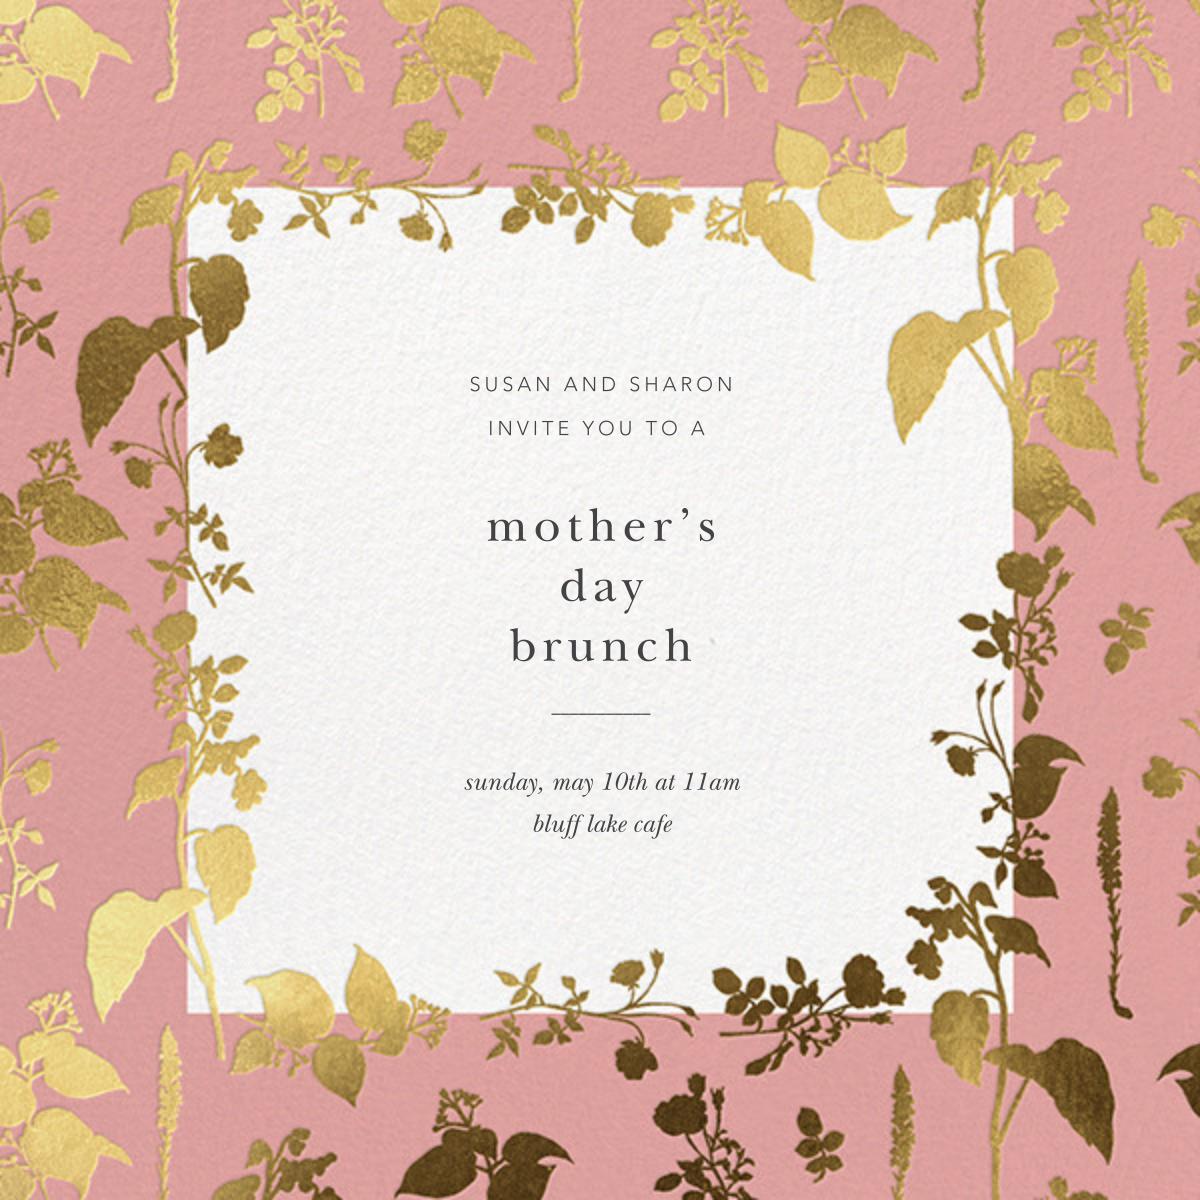 Stamped Greenery - Blossom - Oscar de la Renta - Mother's Day